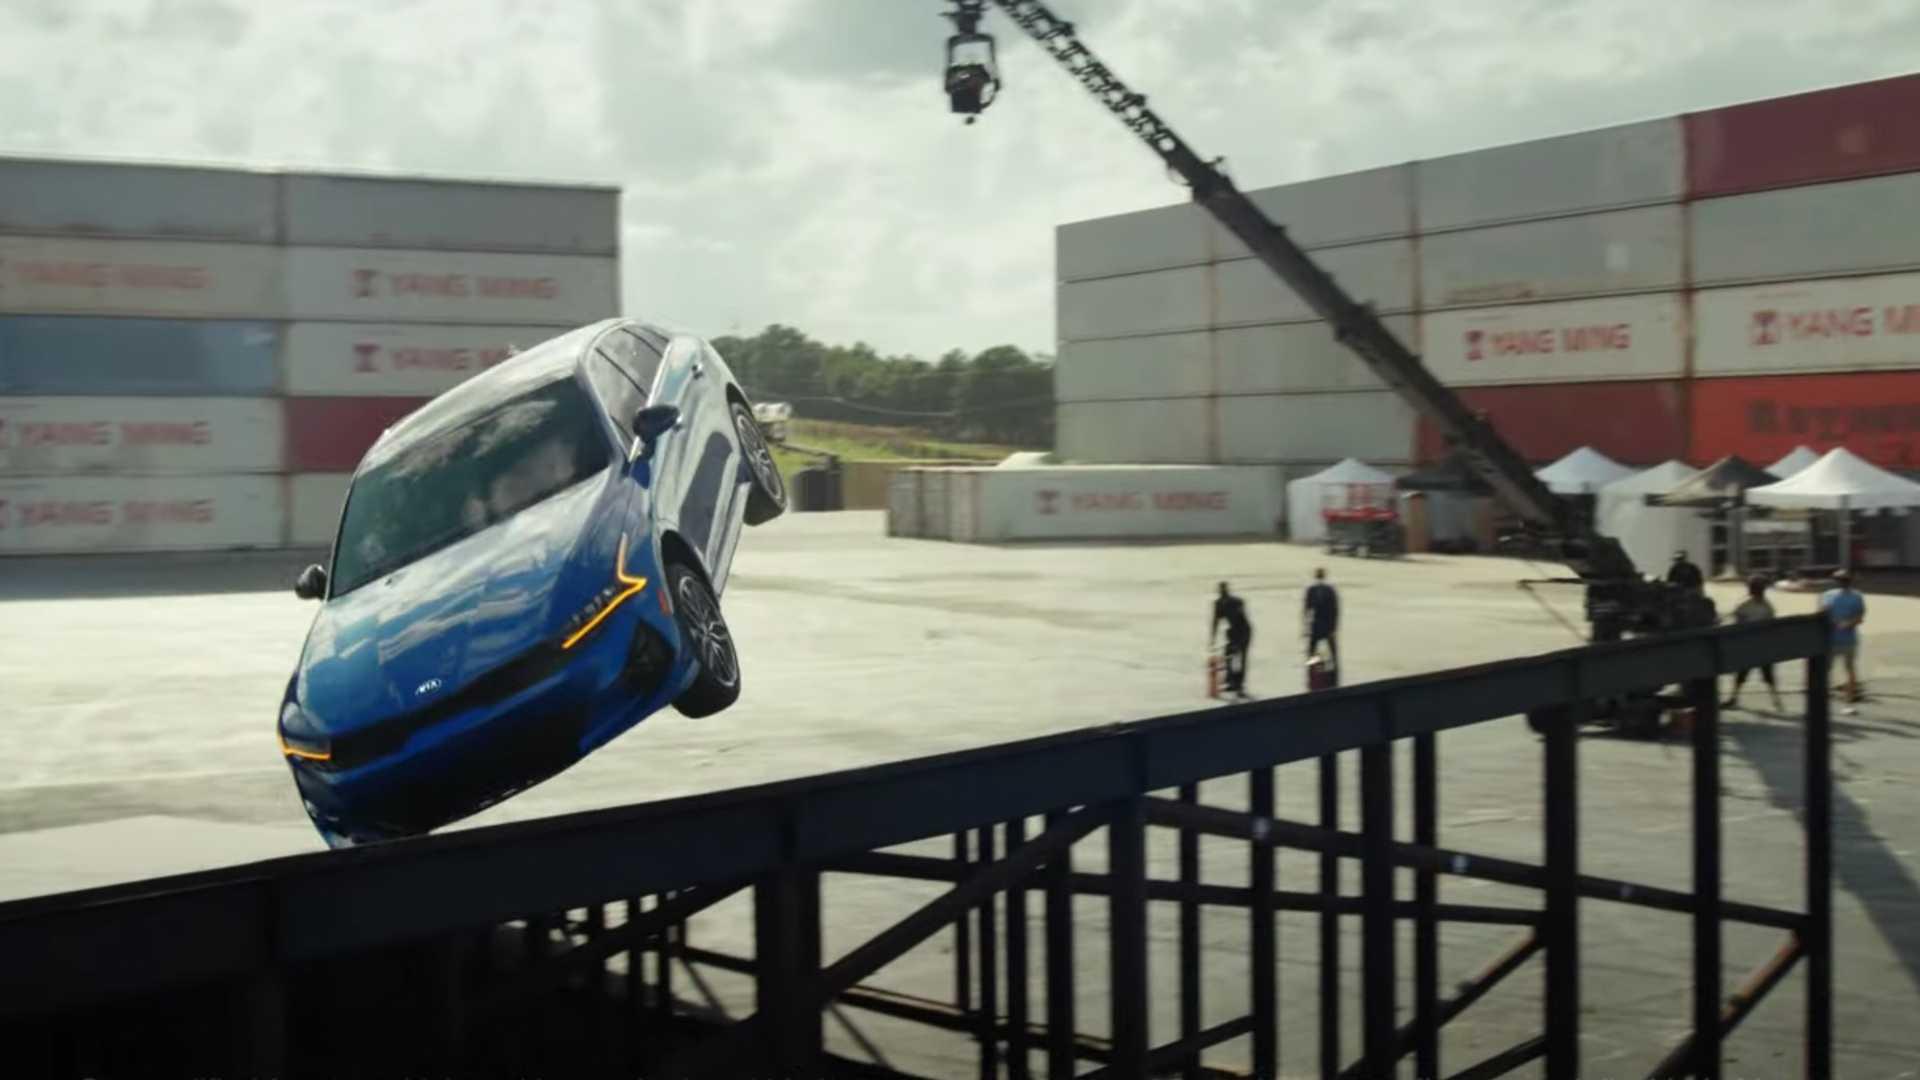 Watch the Kia K5 Land 360 ° between two ramps